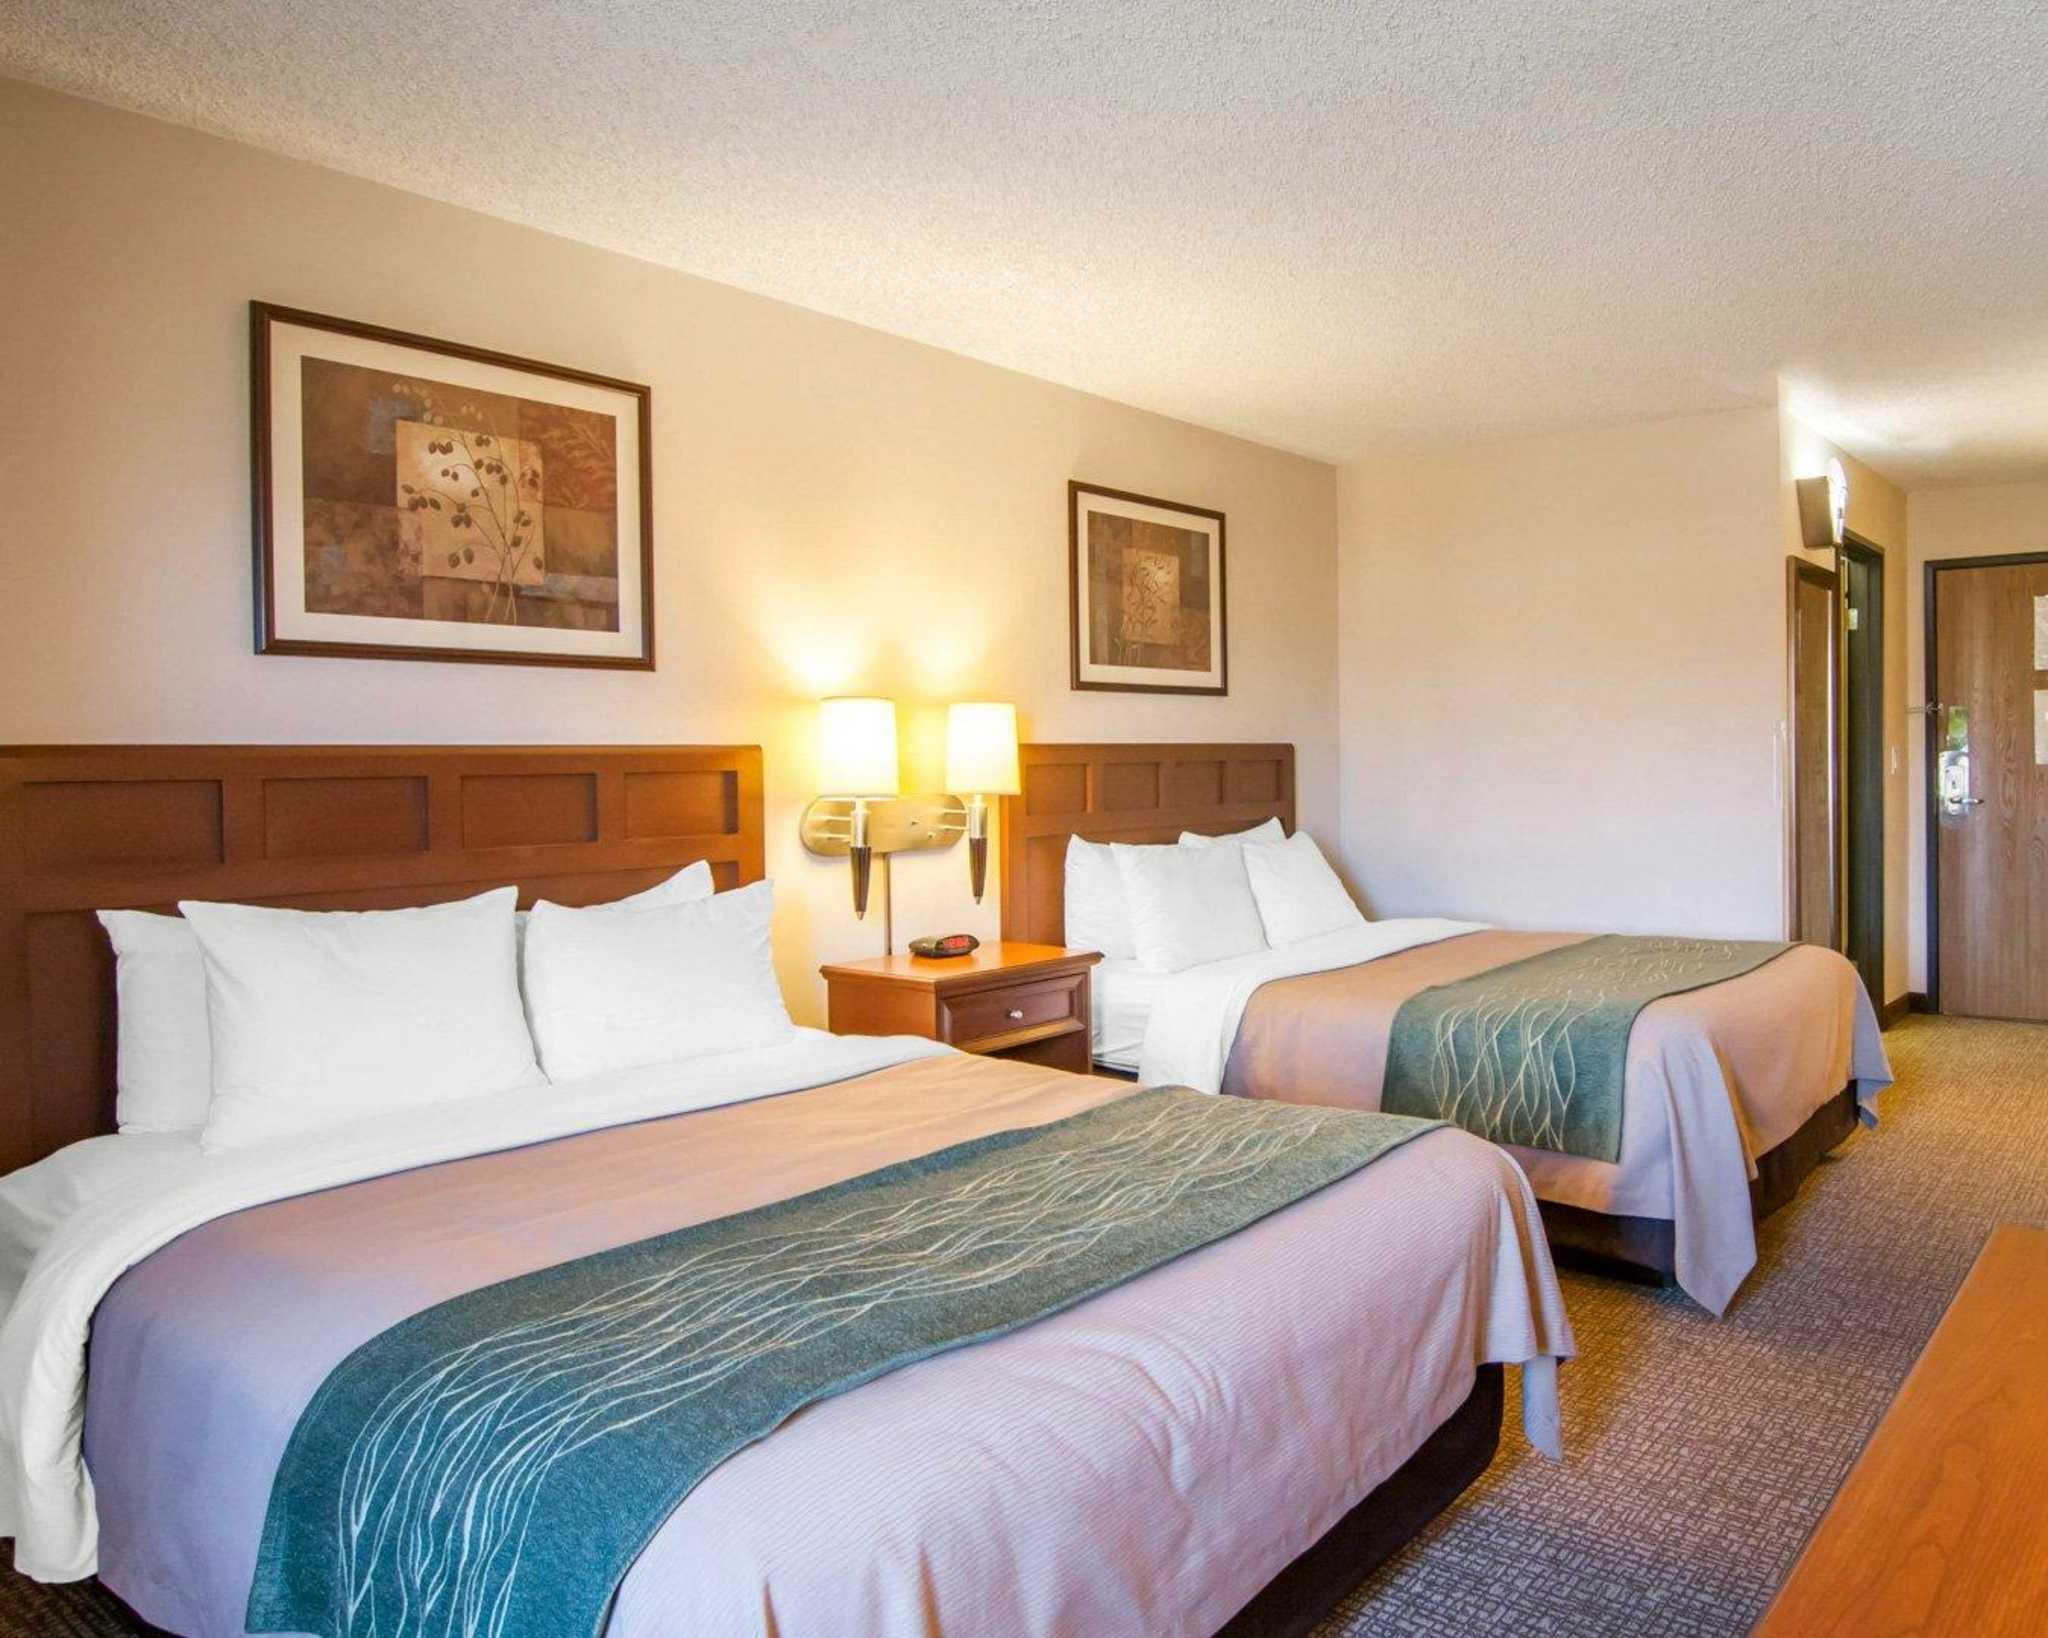 Comfort Inn North image 12